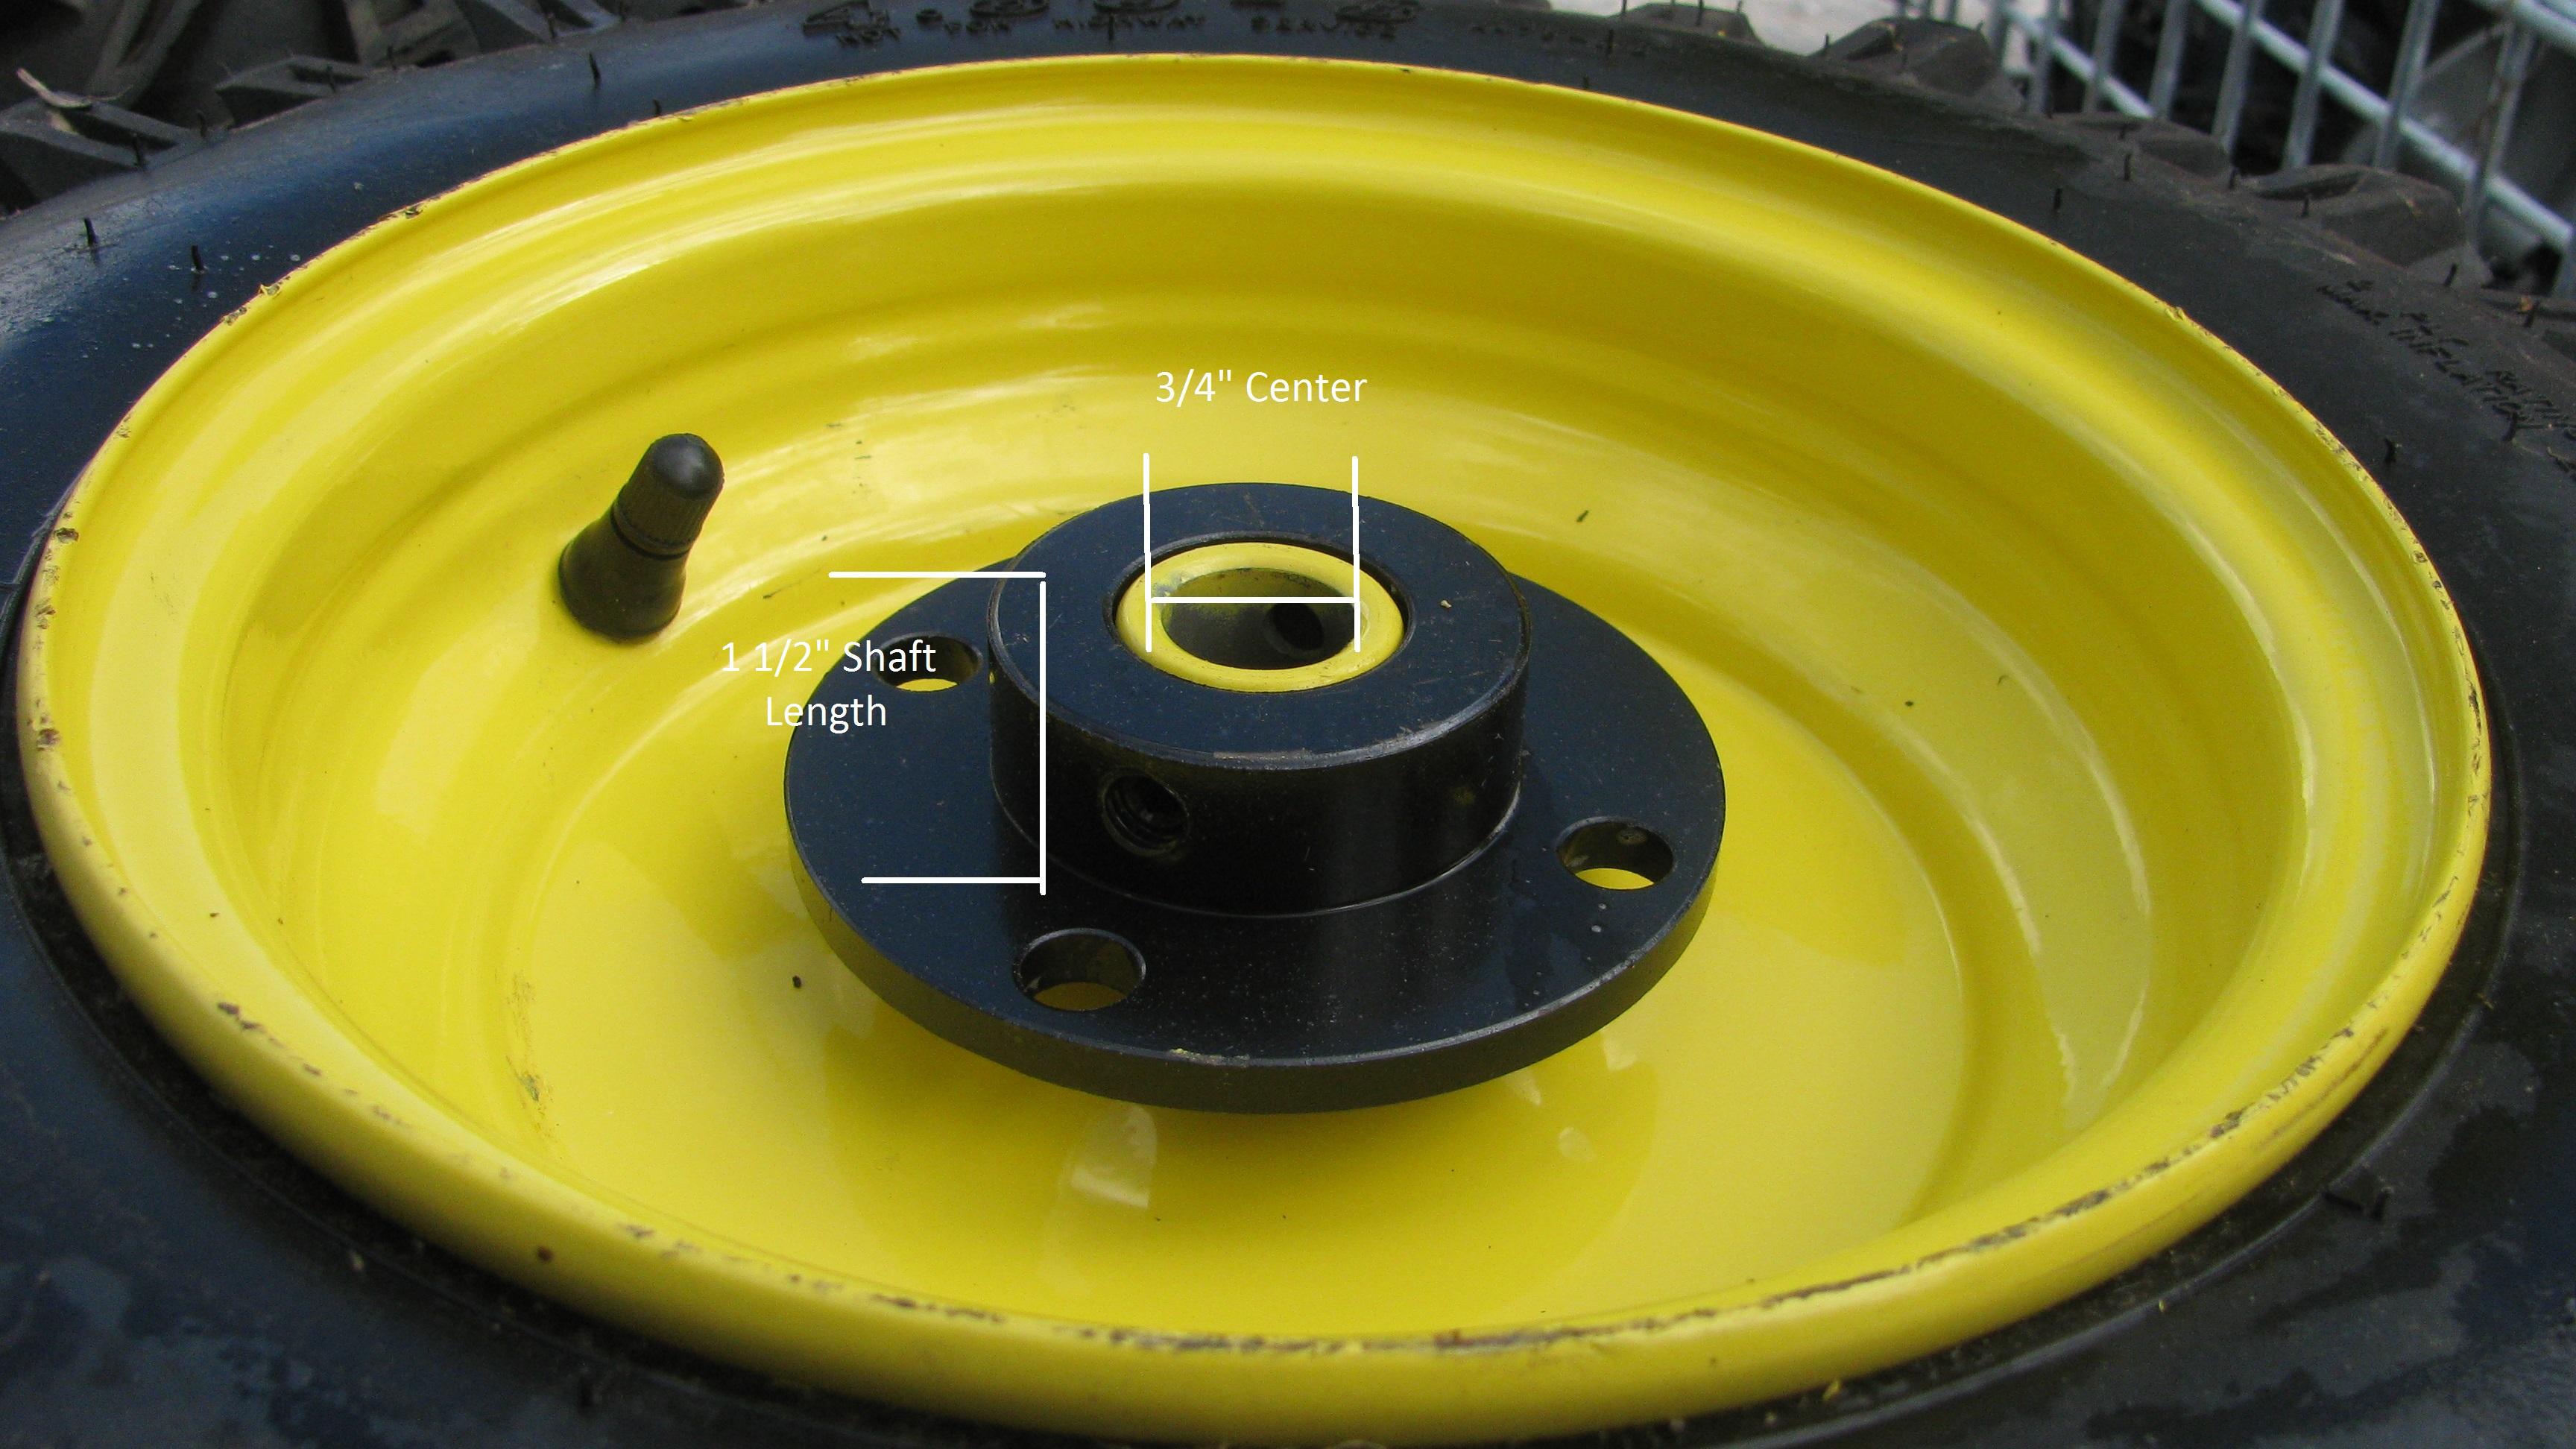 1 4 80 8 4 80x8 480 8 Snow Blower Thrower Tiller Tire Rim Wheel Assembly Right